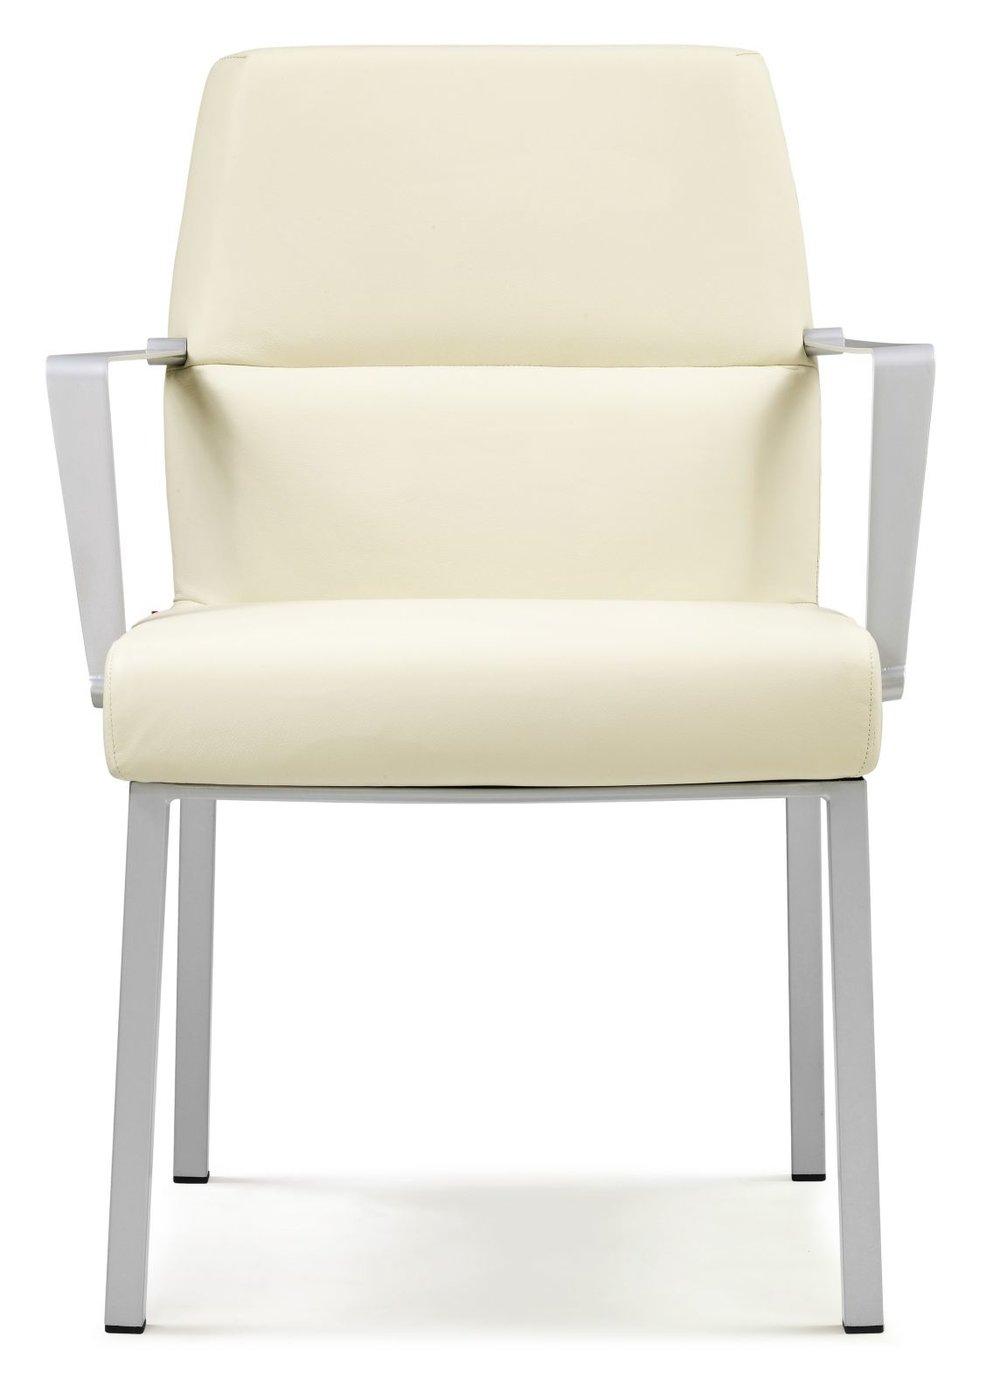 modern-office-armchairs-Italian-furniture-designer-armchairs (46).jpg